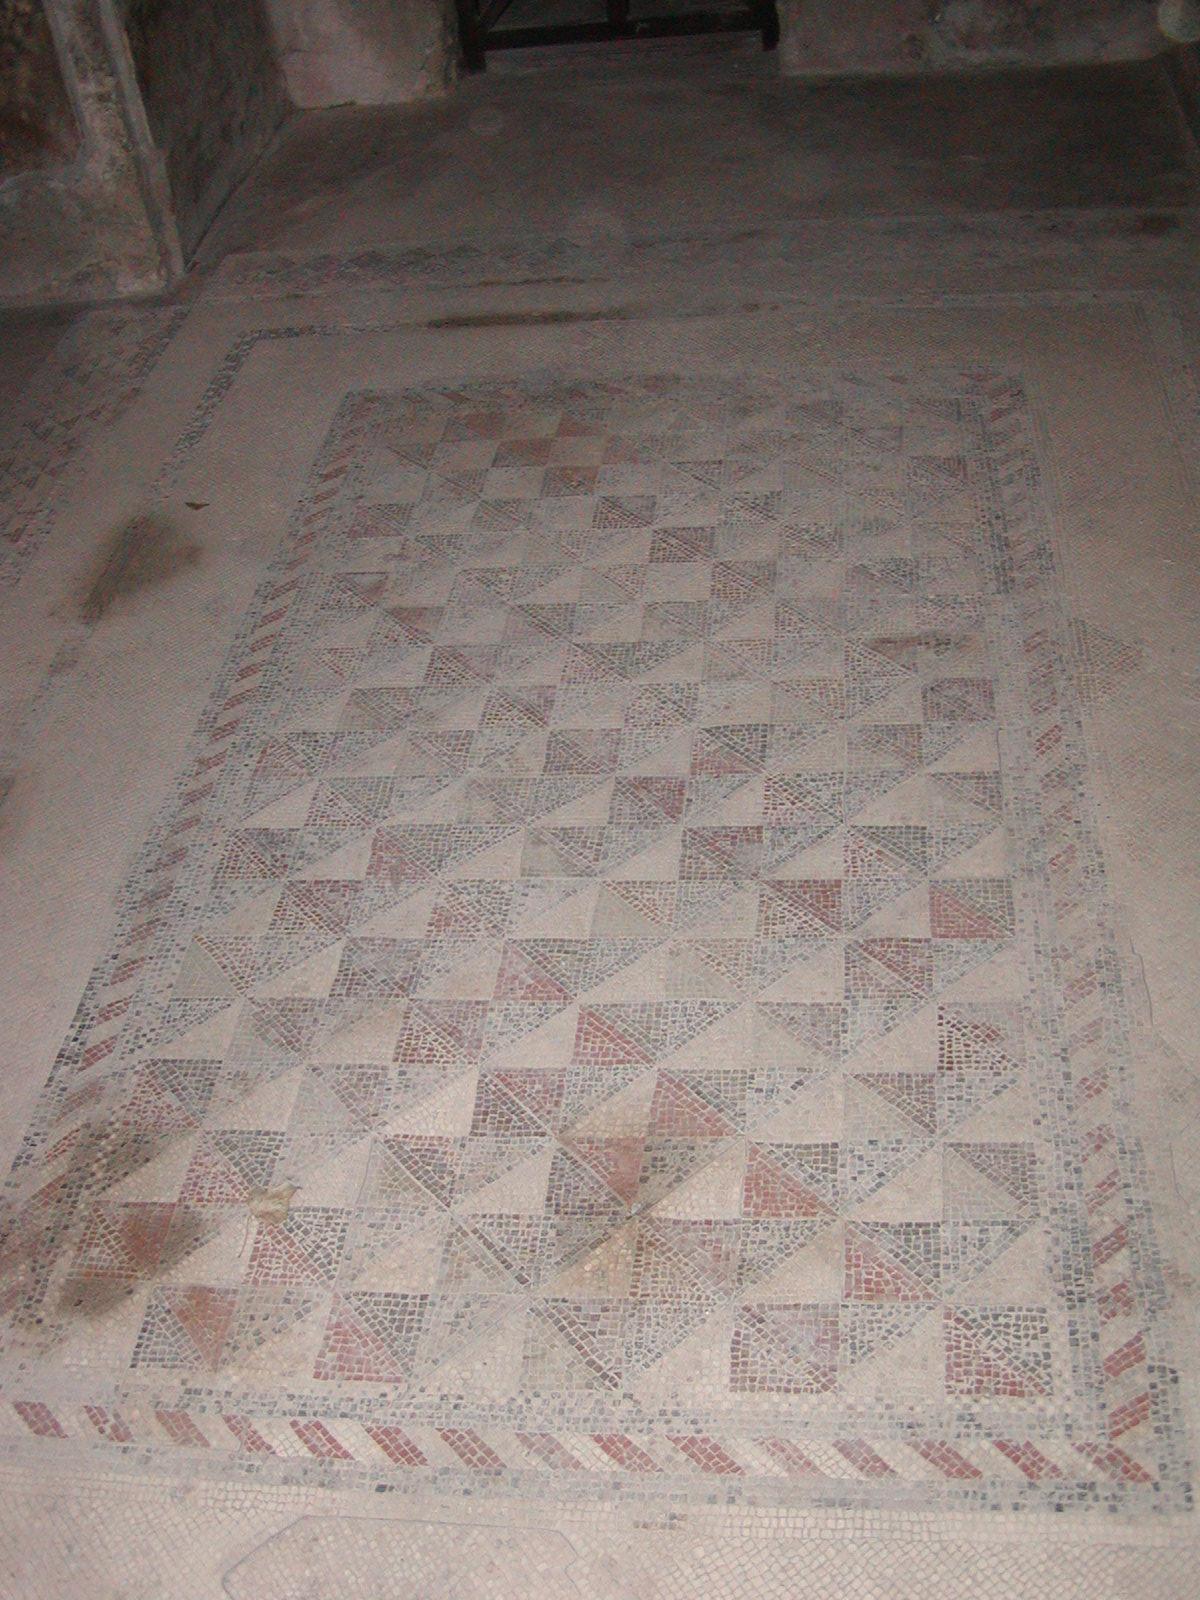 Pompeii - 2002-09-14-180619